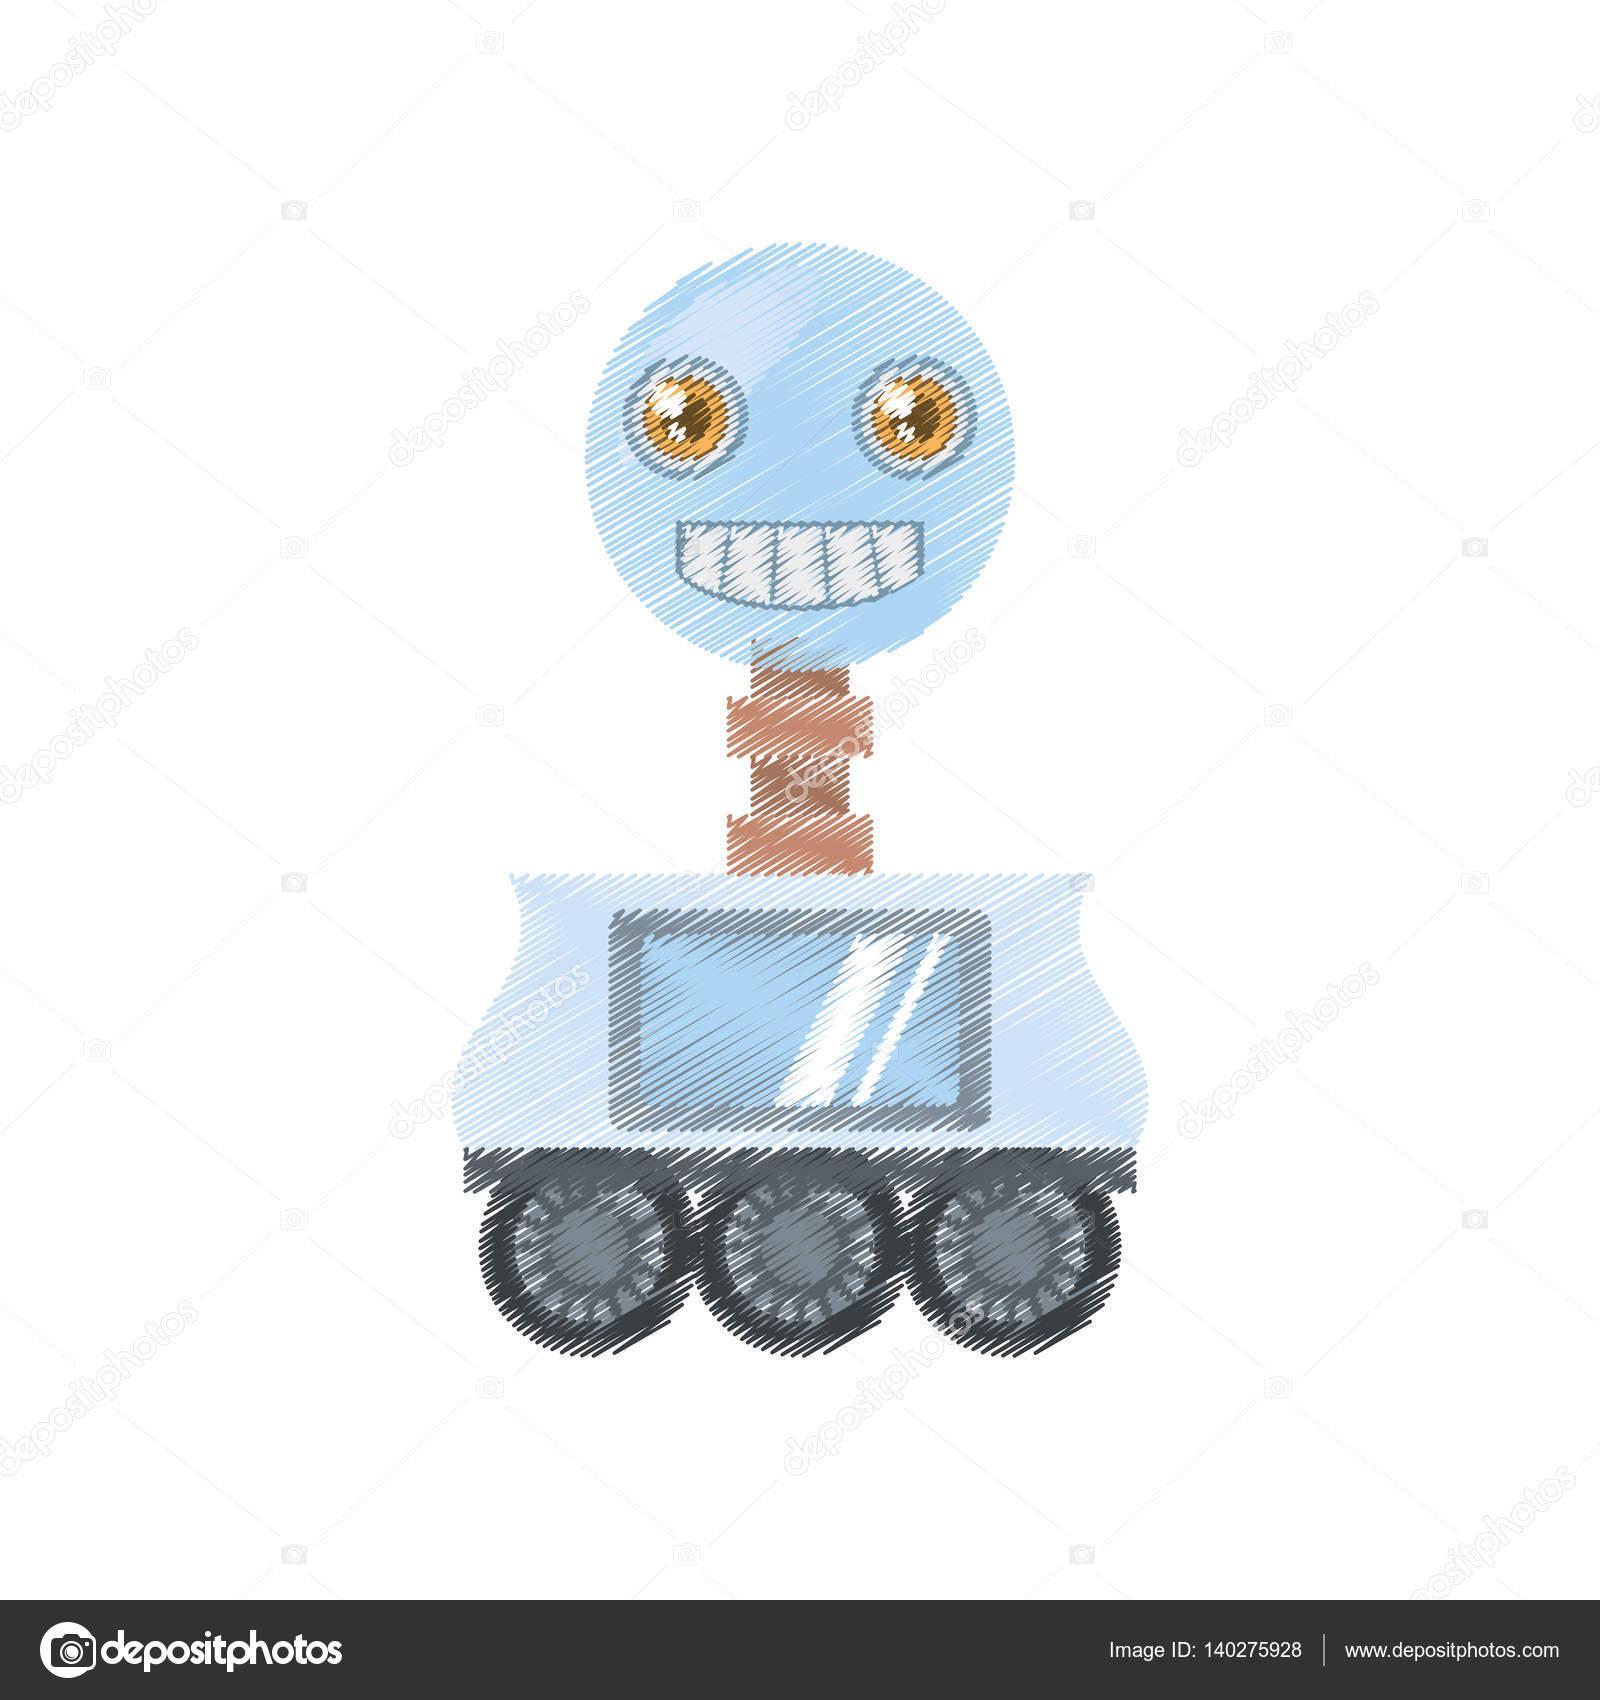 1600x1700 Drawing Arificial Intelligence Robotic Smiling Screen Stock